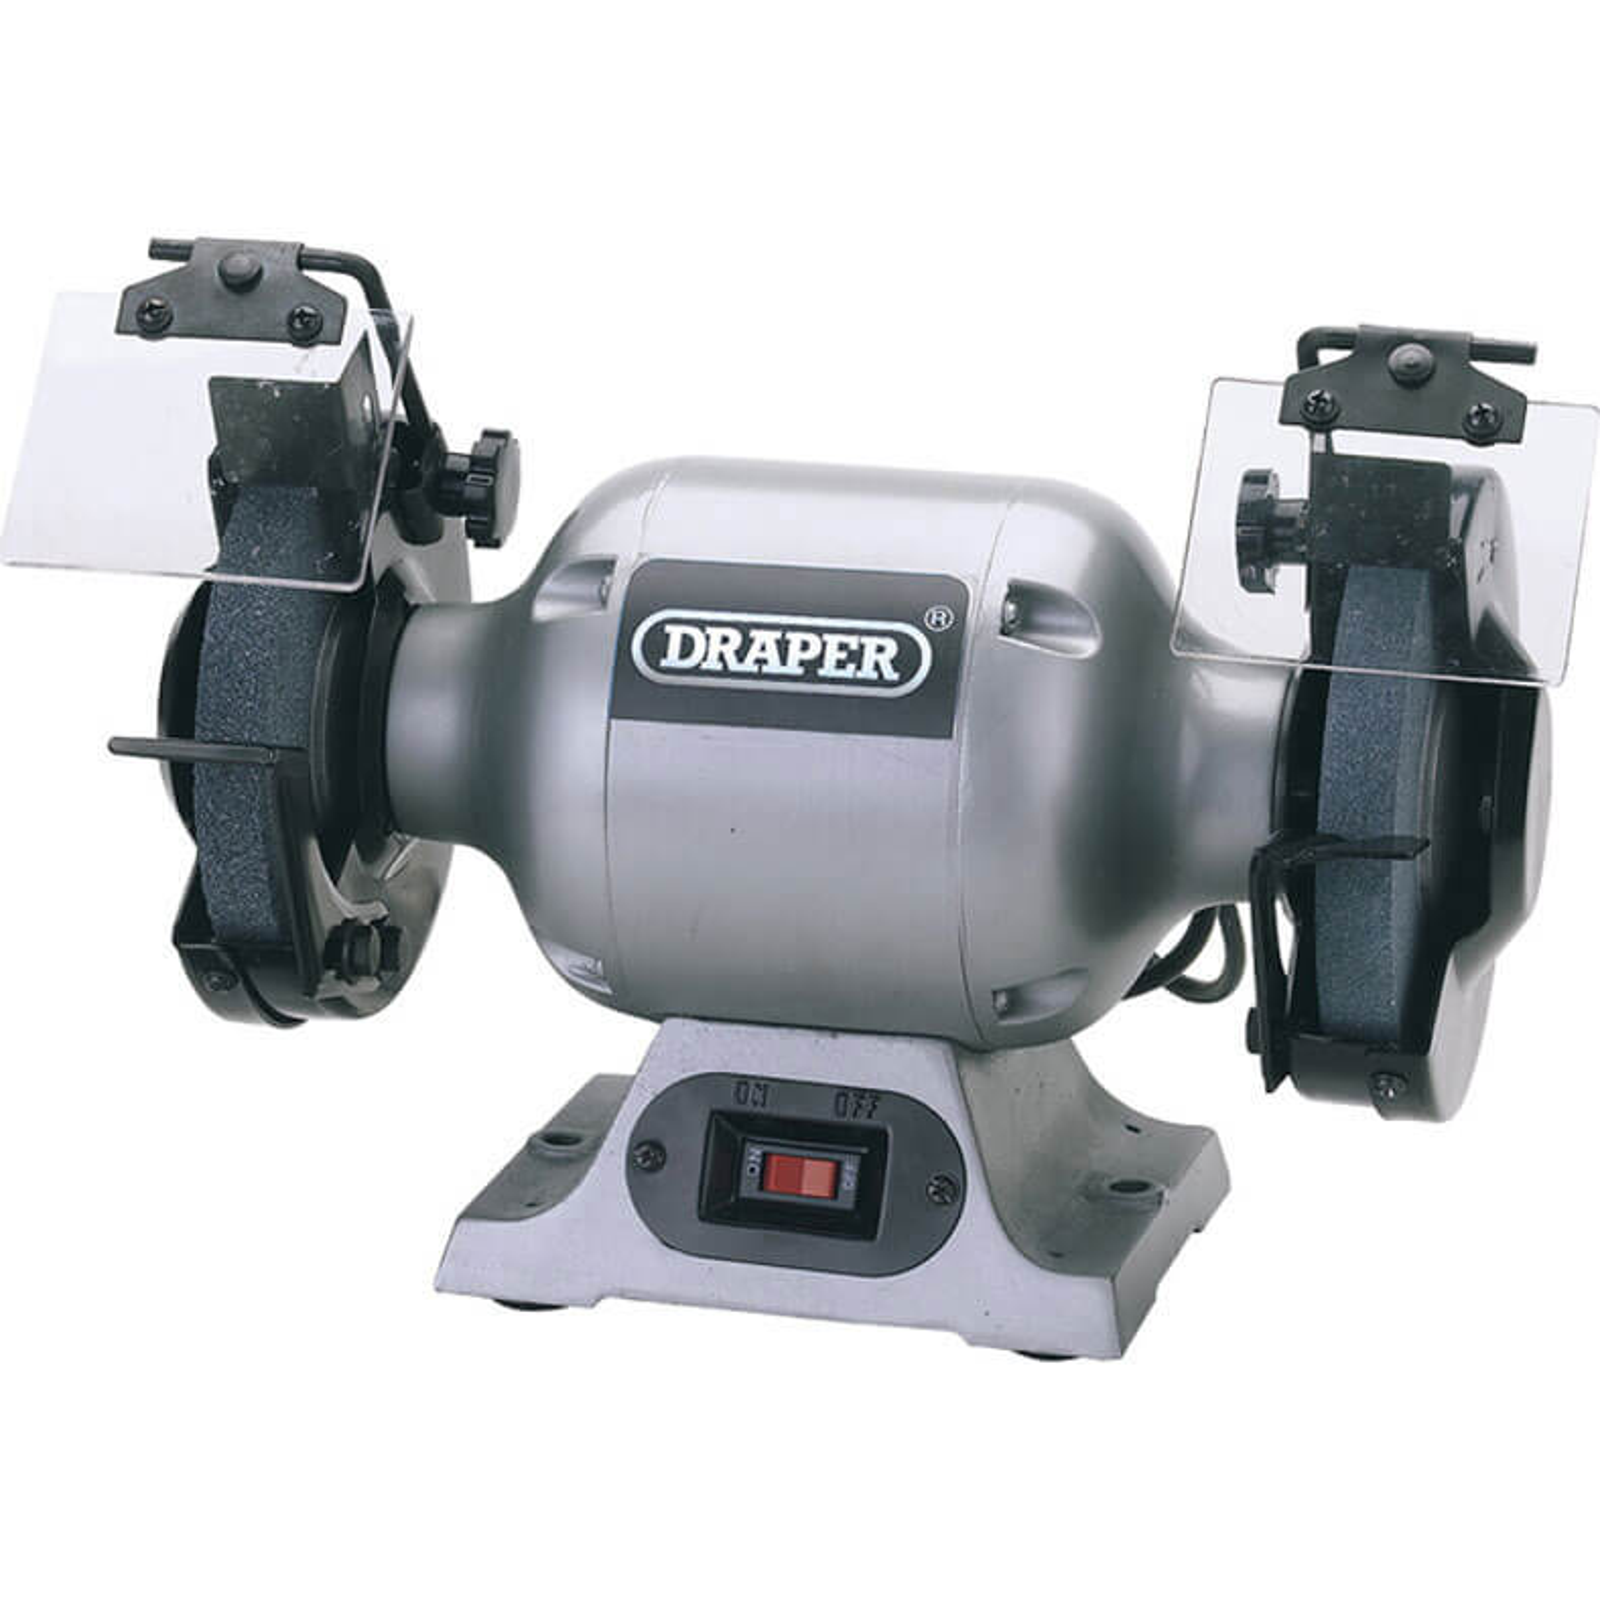 Image of Draper GHD150 150mm Heavy Duty Bench Grinder 240v